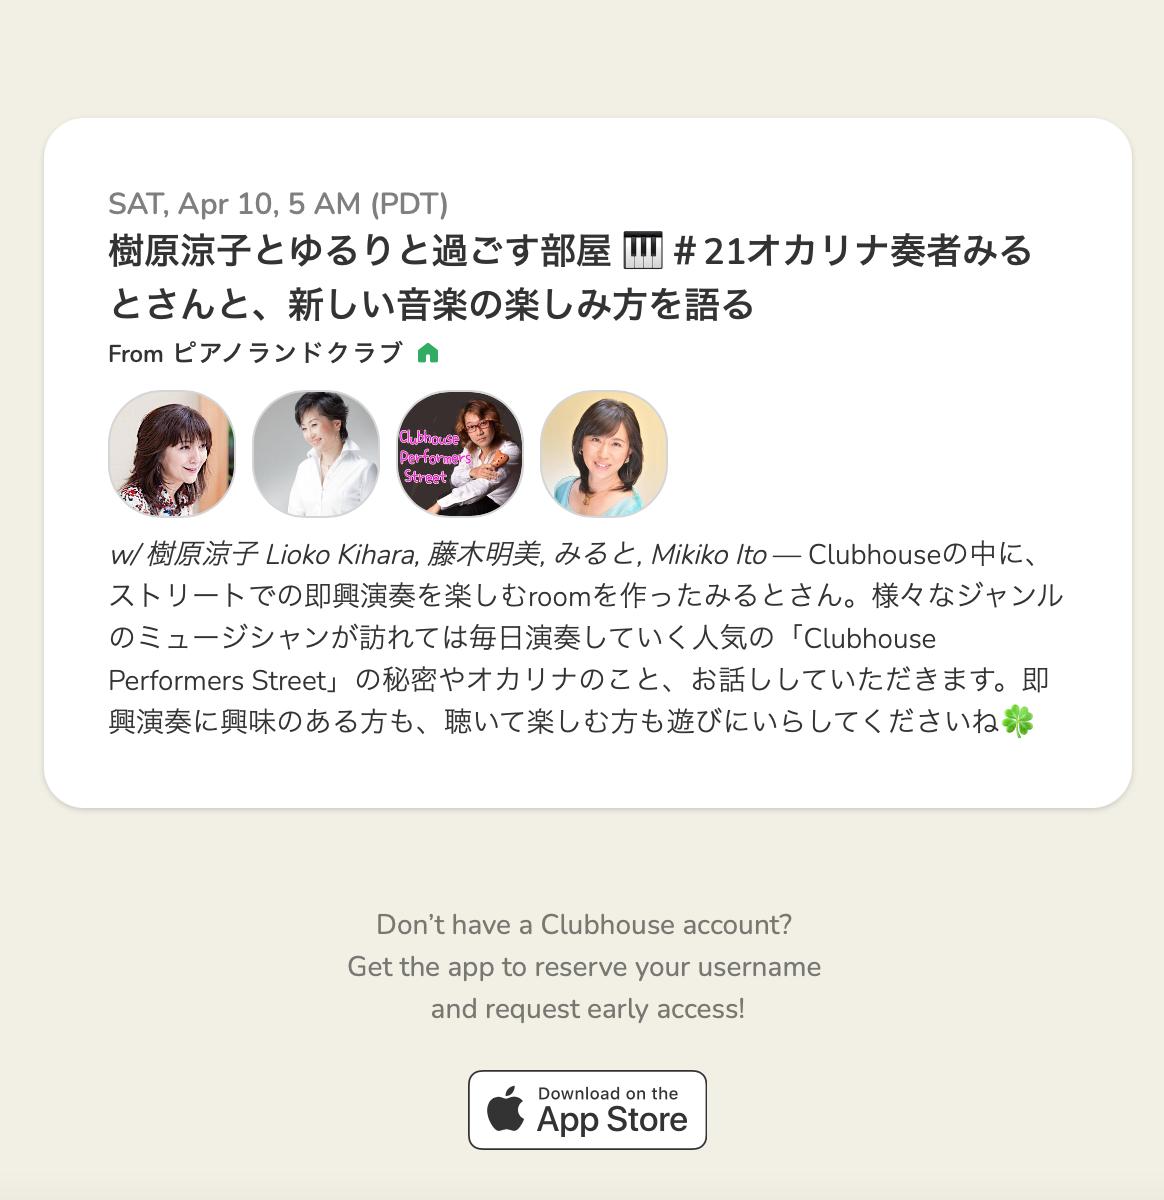 Clubhouse 樹原涼子とゆるりと過ごす部屋 🎹#21 オカリナ奏者みるとさんと、新しい音楽の楽しみ方を語る